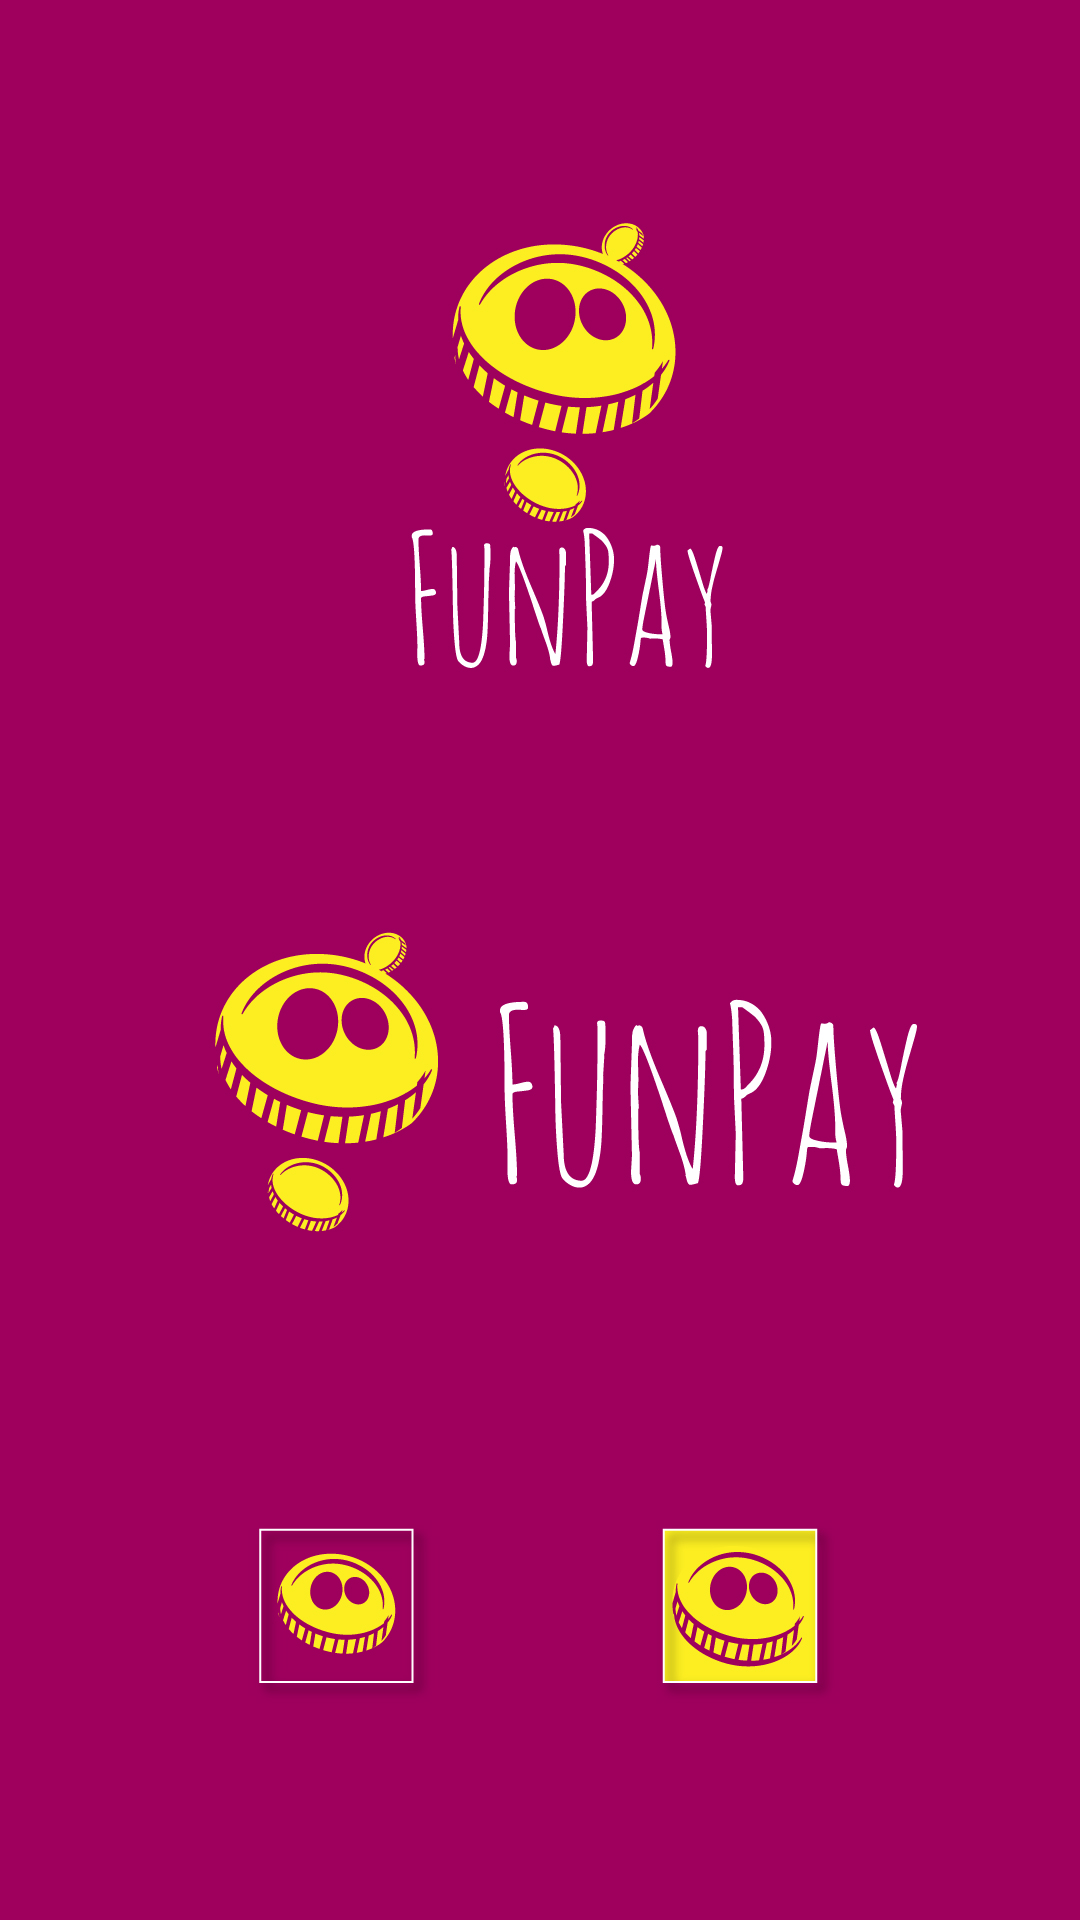 Логотип для FunPay.ru фото f_57059a06887abb1f.jpg